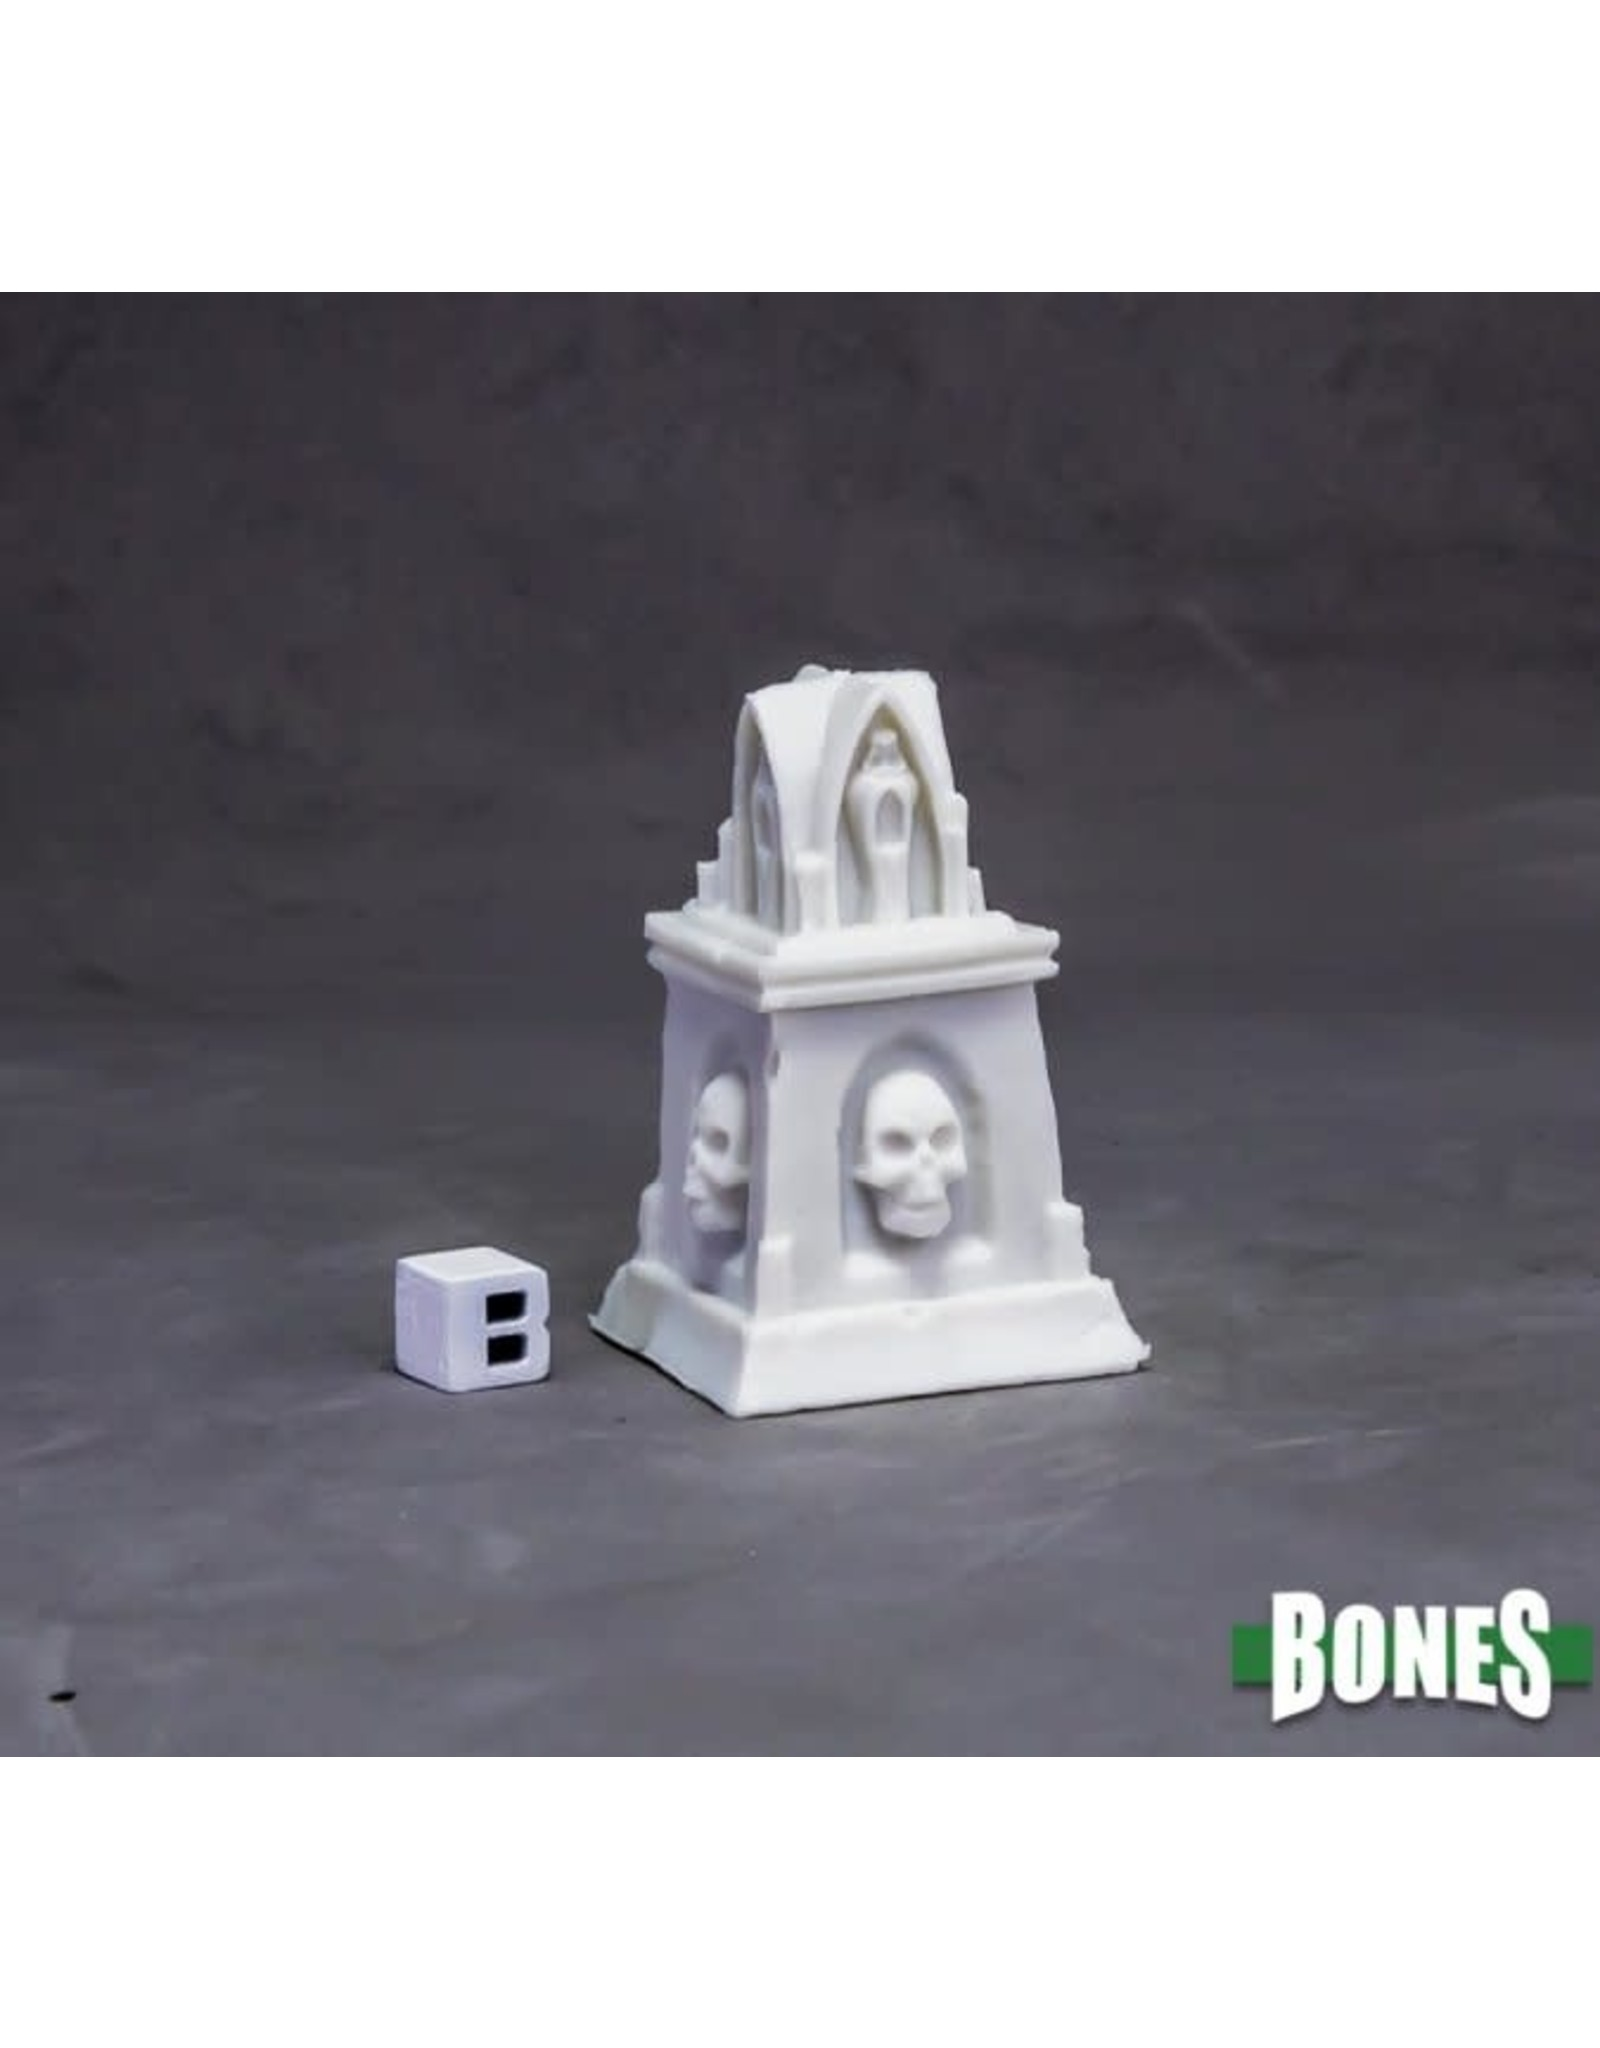 Reaper Miniatures Bones Graveyard Shrine